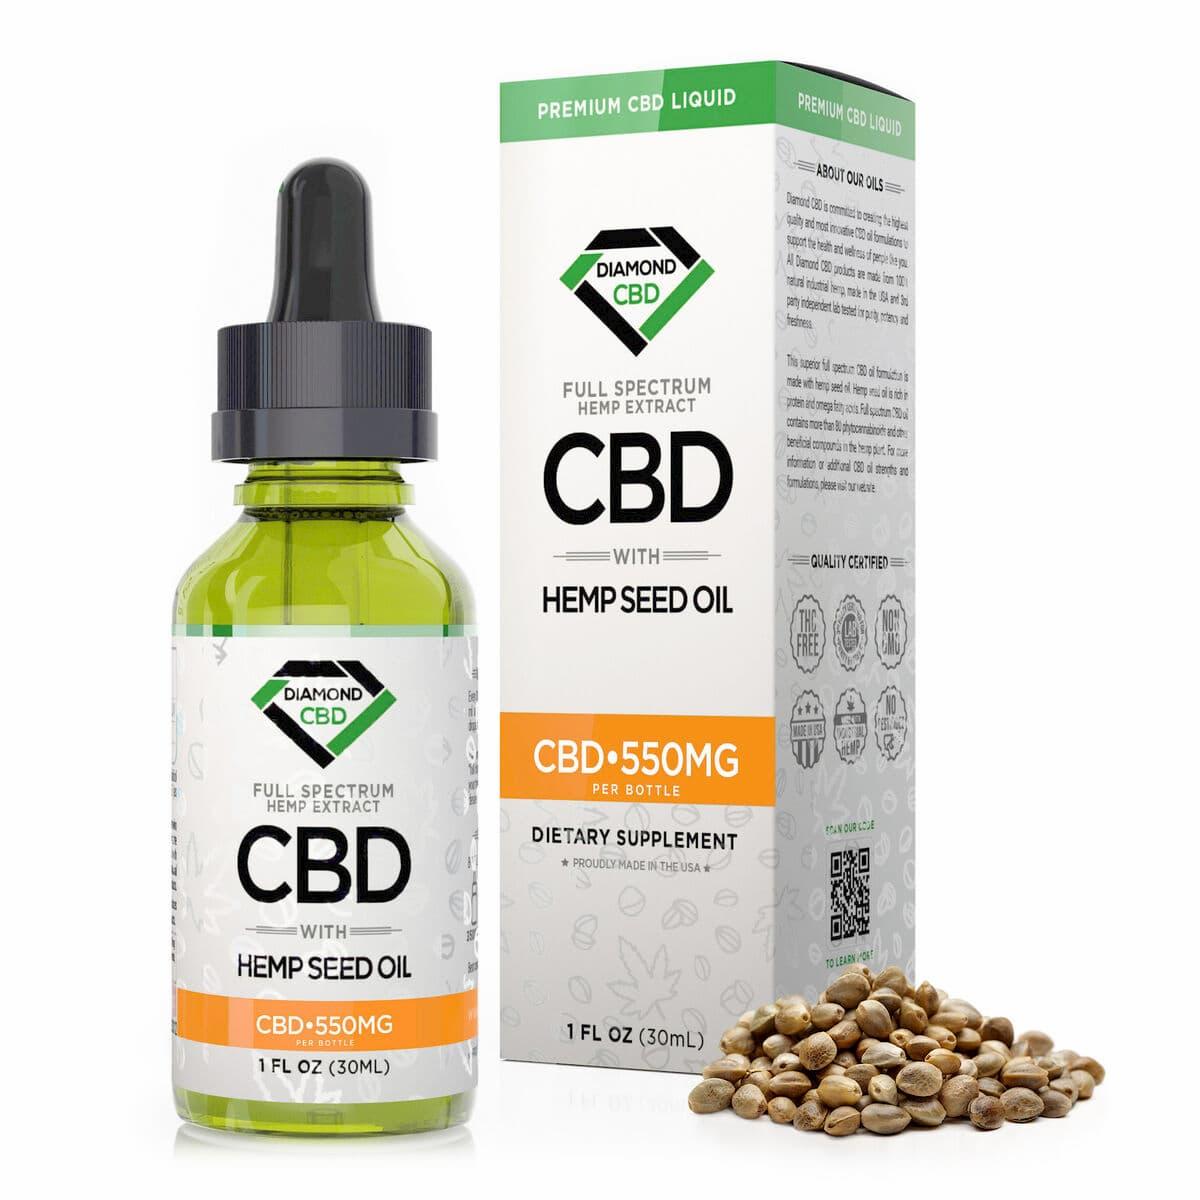 Diamond CBD, Hemp Seed Oil, 1oz, 550mg of CBD